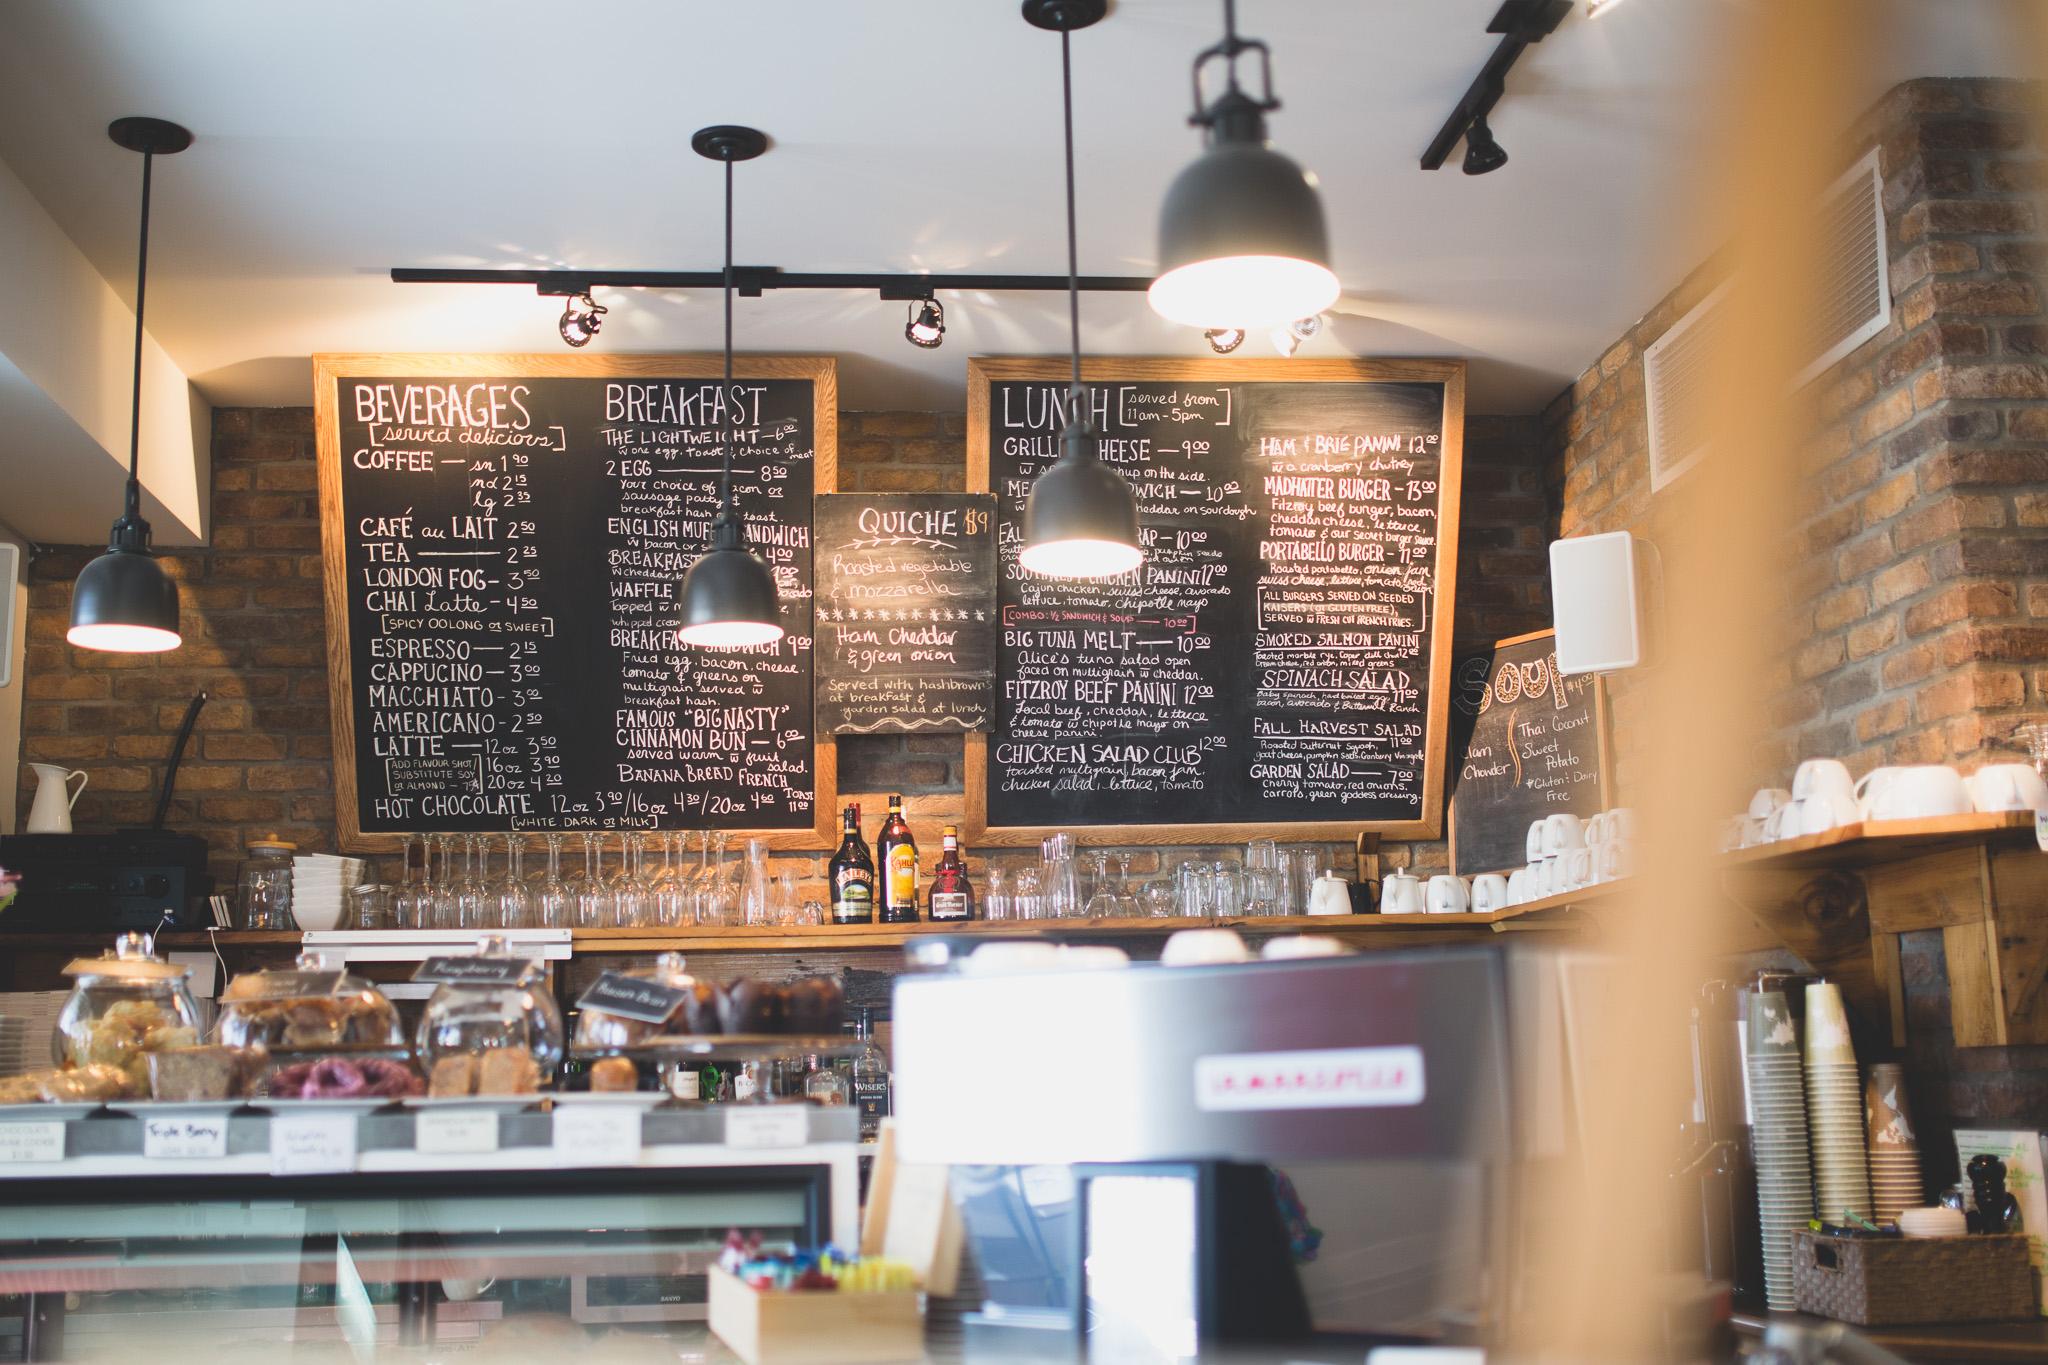 004-Jonathan-Kuhn-Photography-Alices Cafe Carp ON-2265.jpg